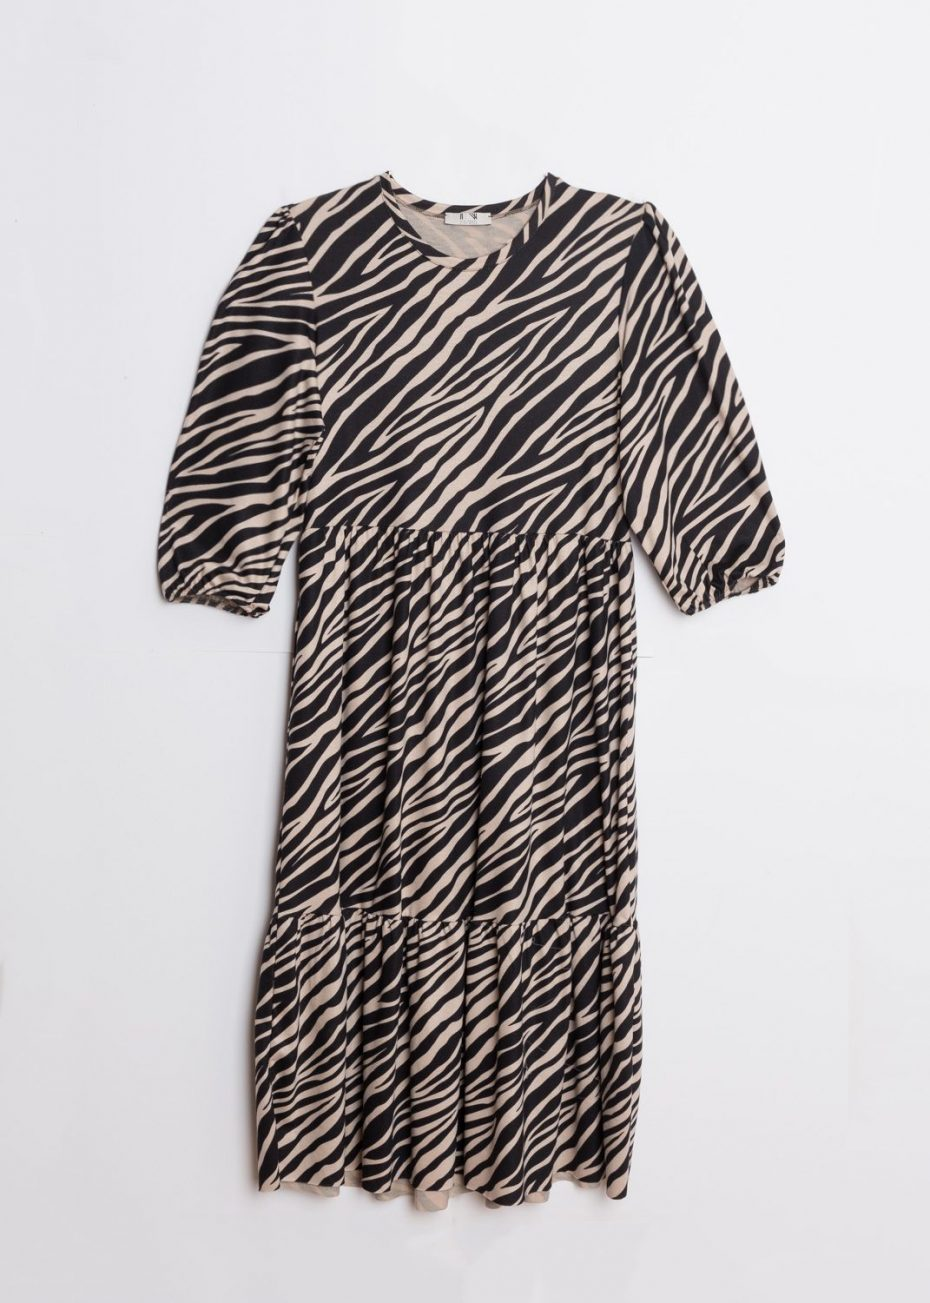 Vestido Largo Cebra de Calma Boutique